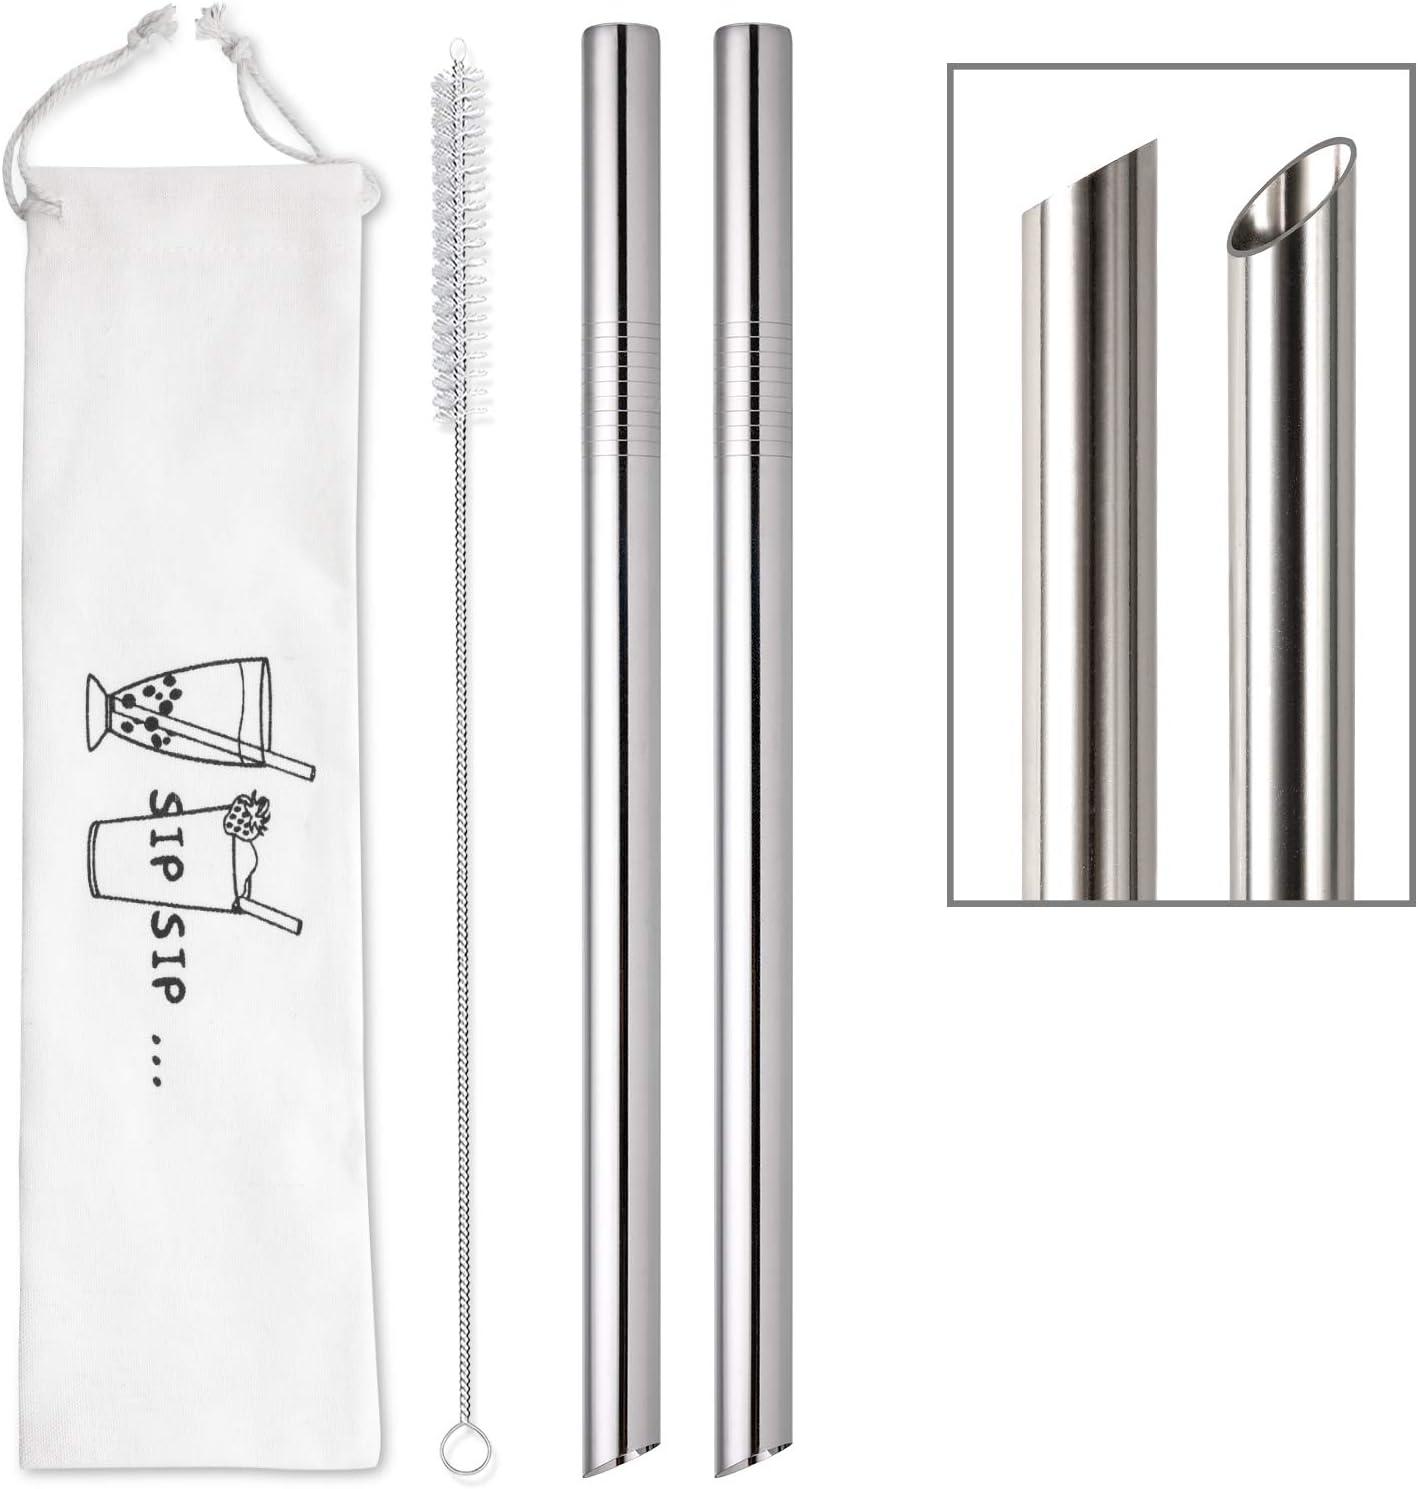 Angled Tips Max 41% OFF 2 Pcs Jumbo Straws Reusable Boba Smoothie 2021 spring and summer new